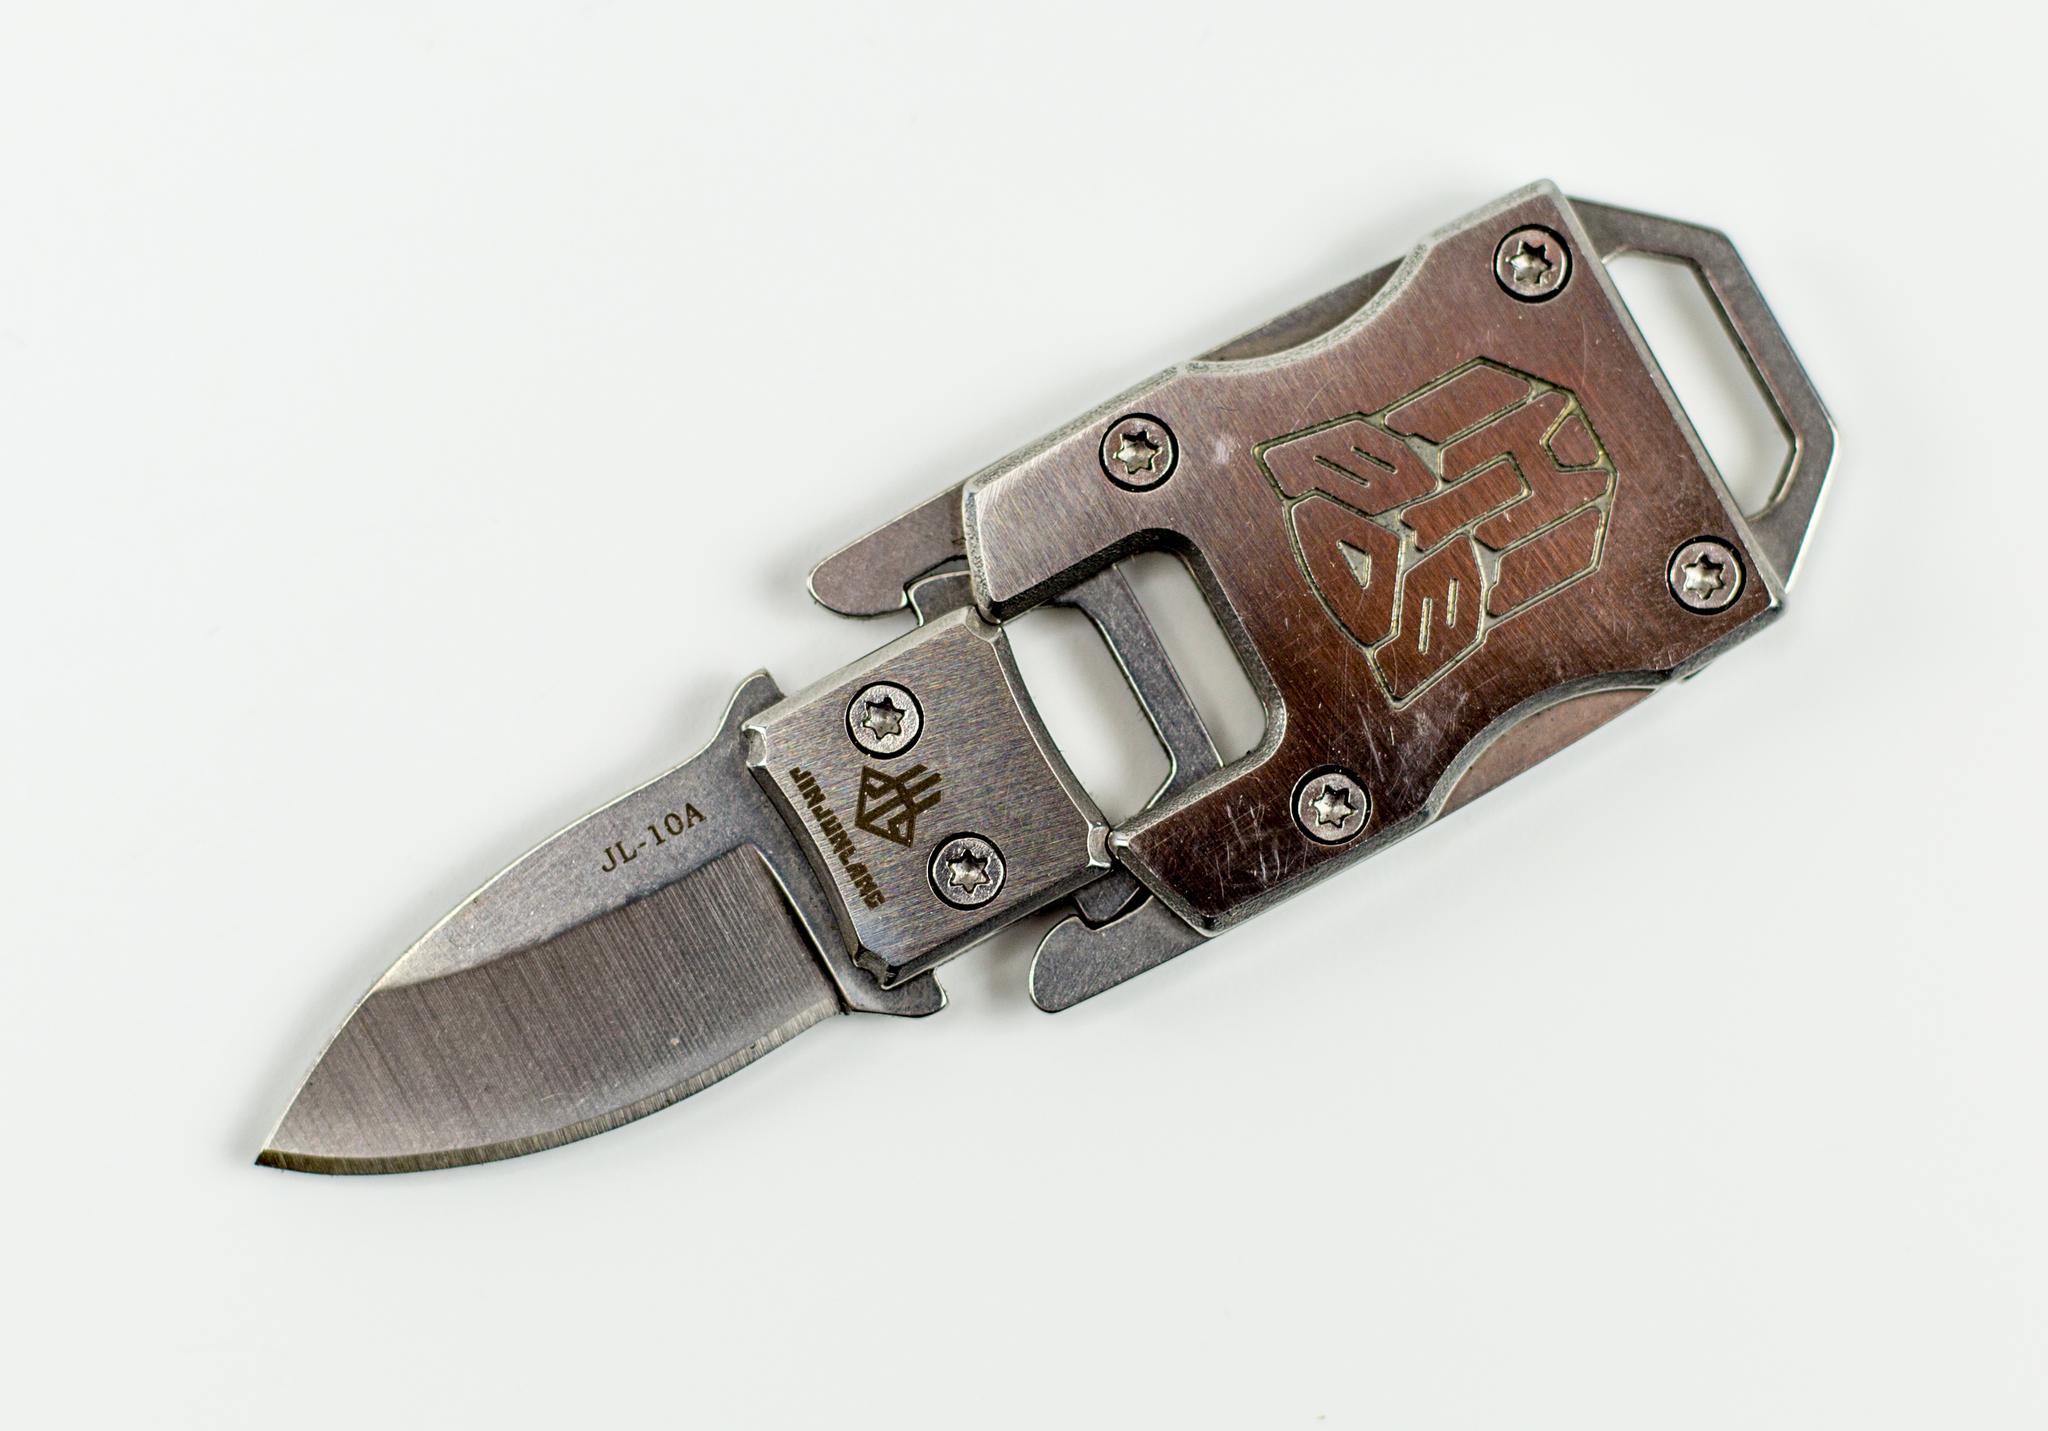 Фото 10 - Шейный нож Prime от Noname